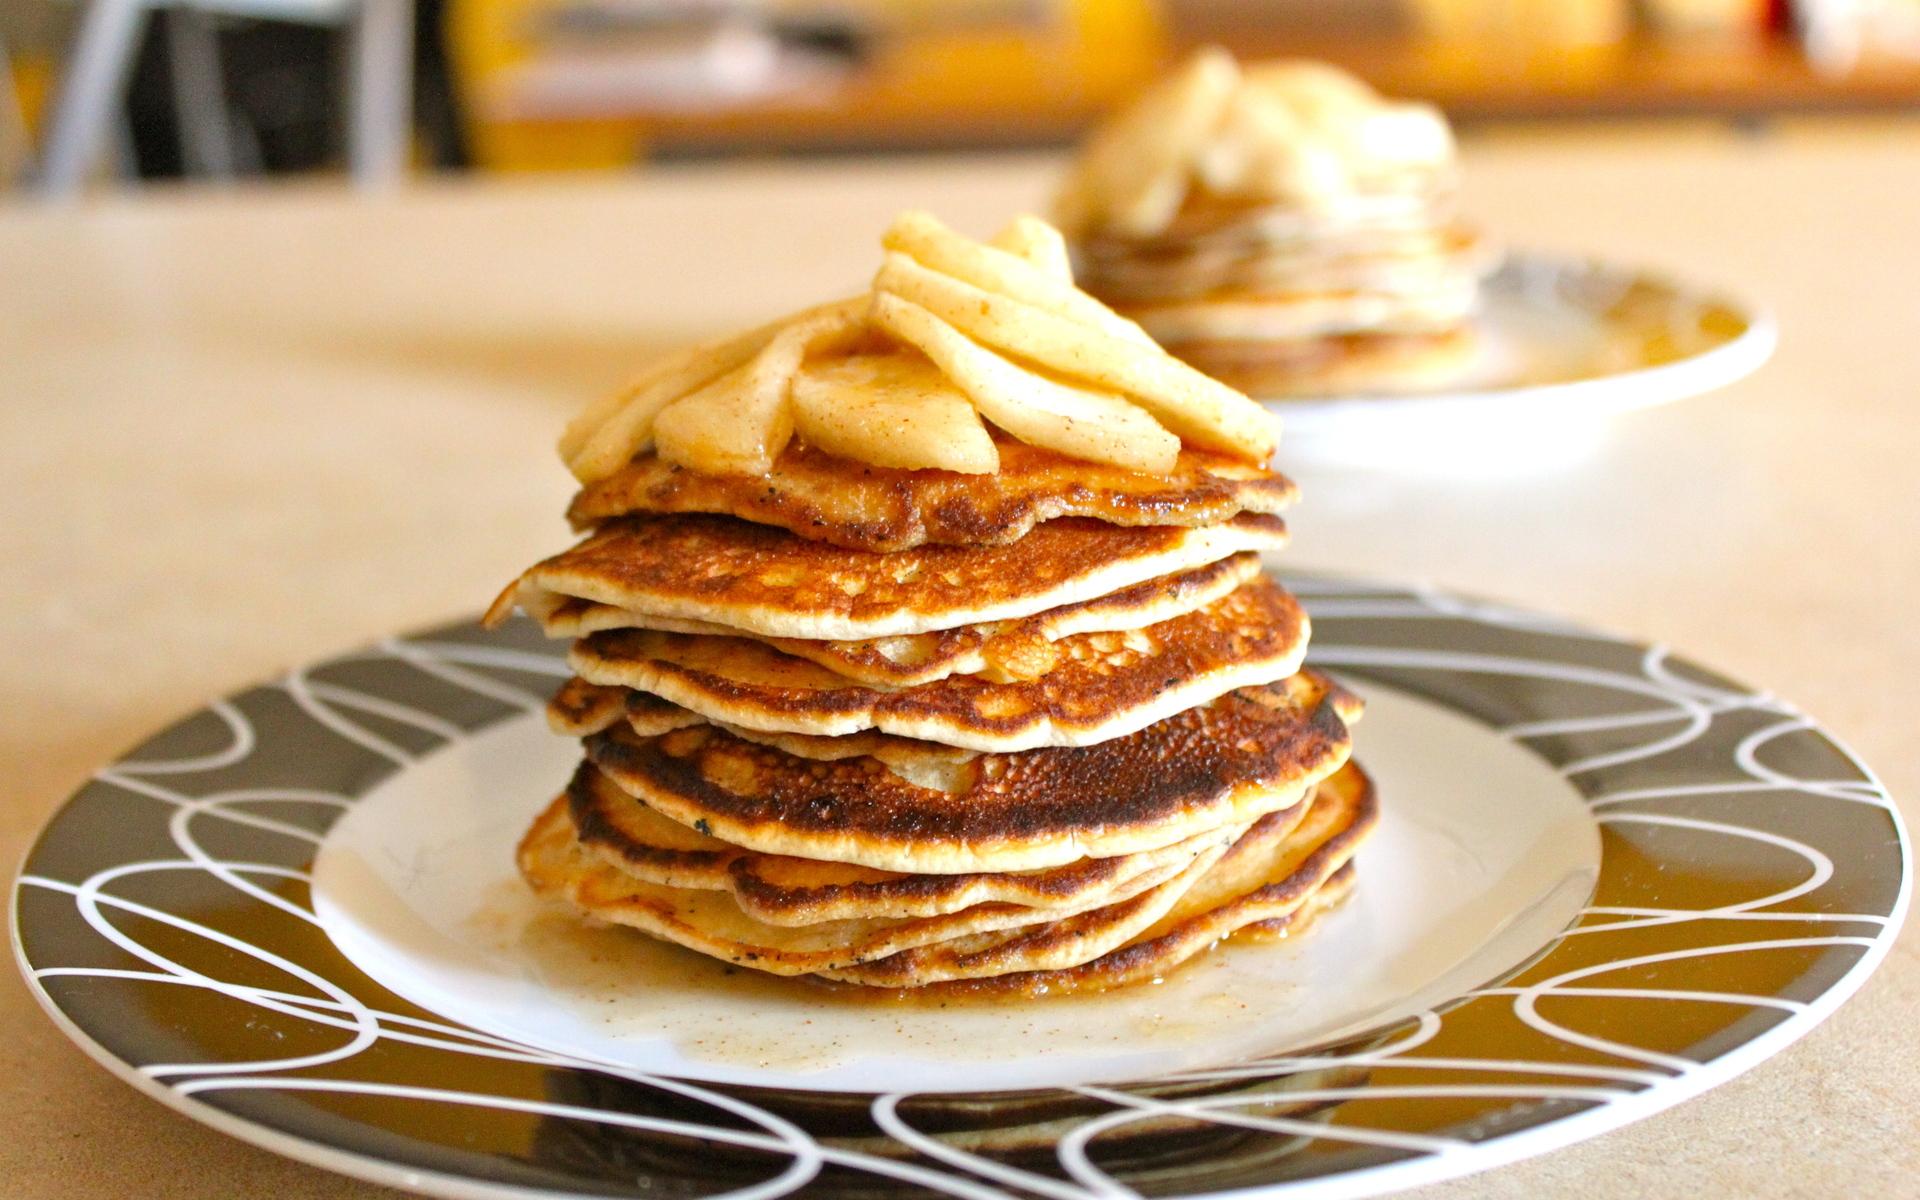 Beautiful Pancakes wallpaper 1920x1200 23858 1920x1200